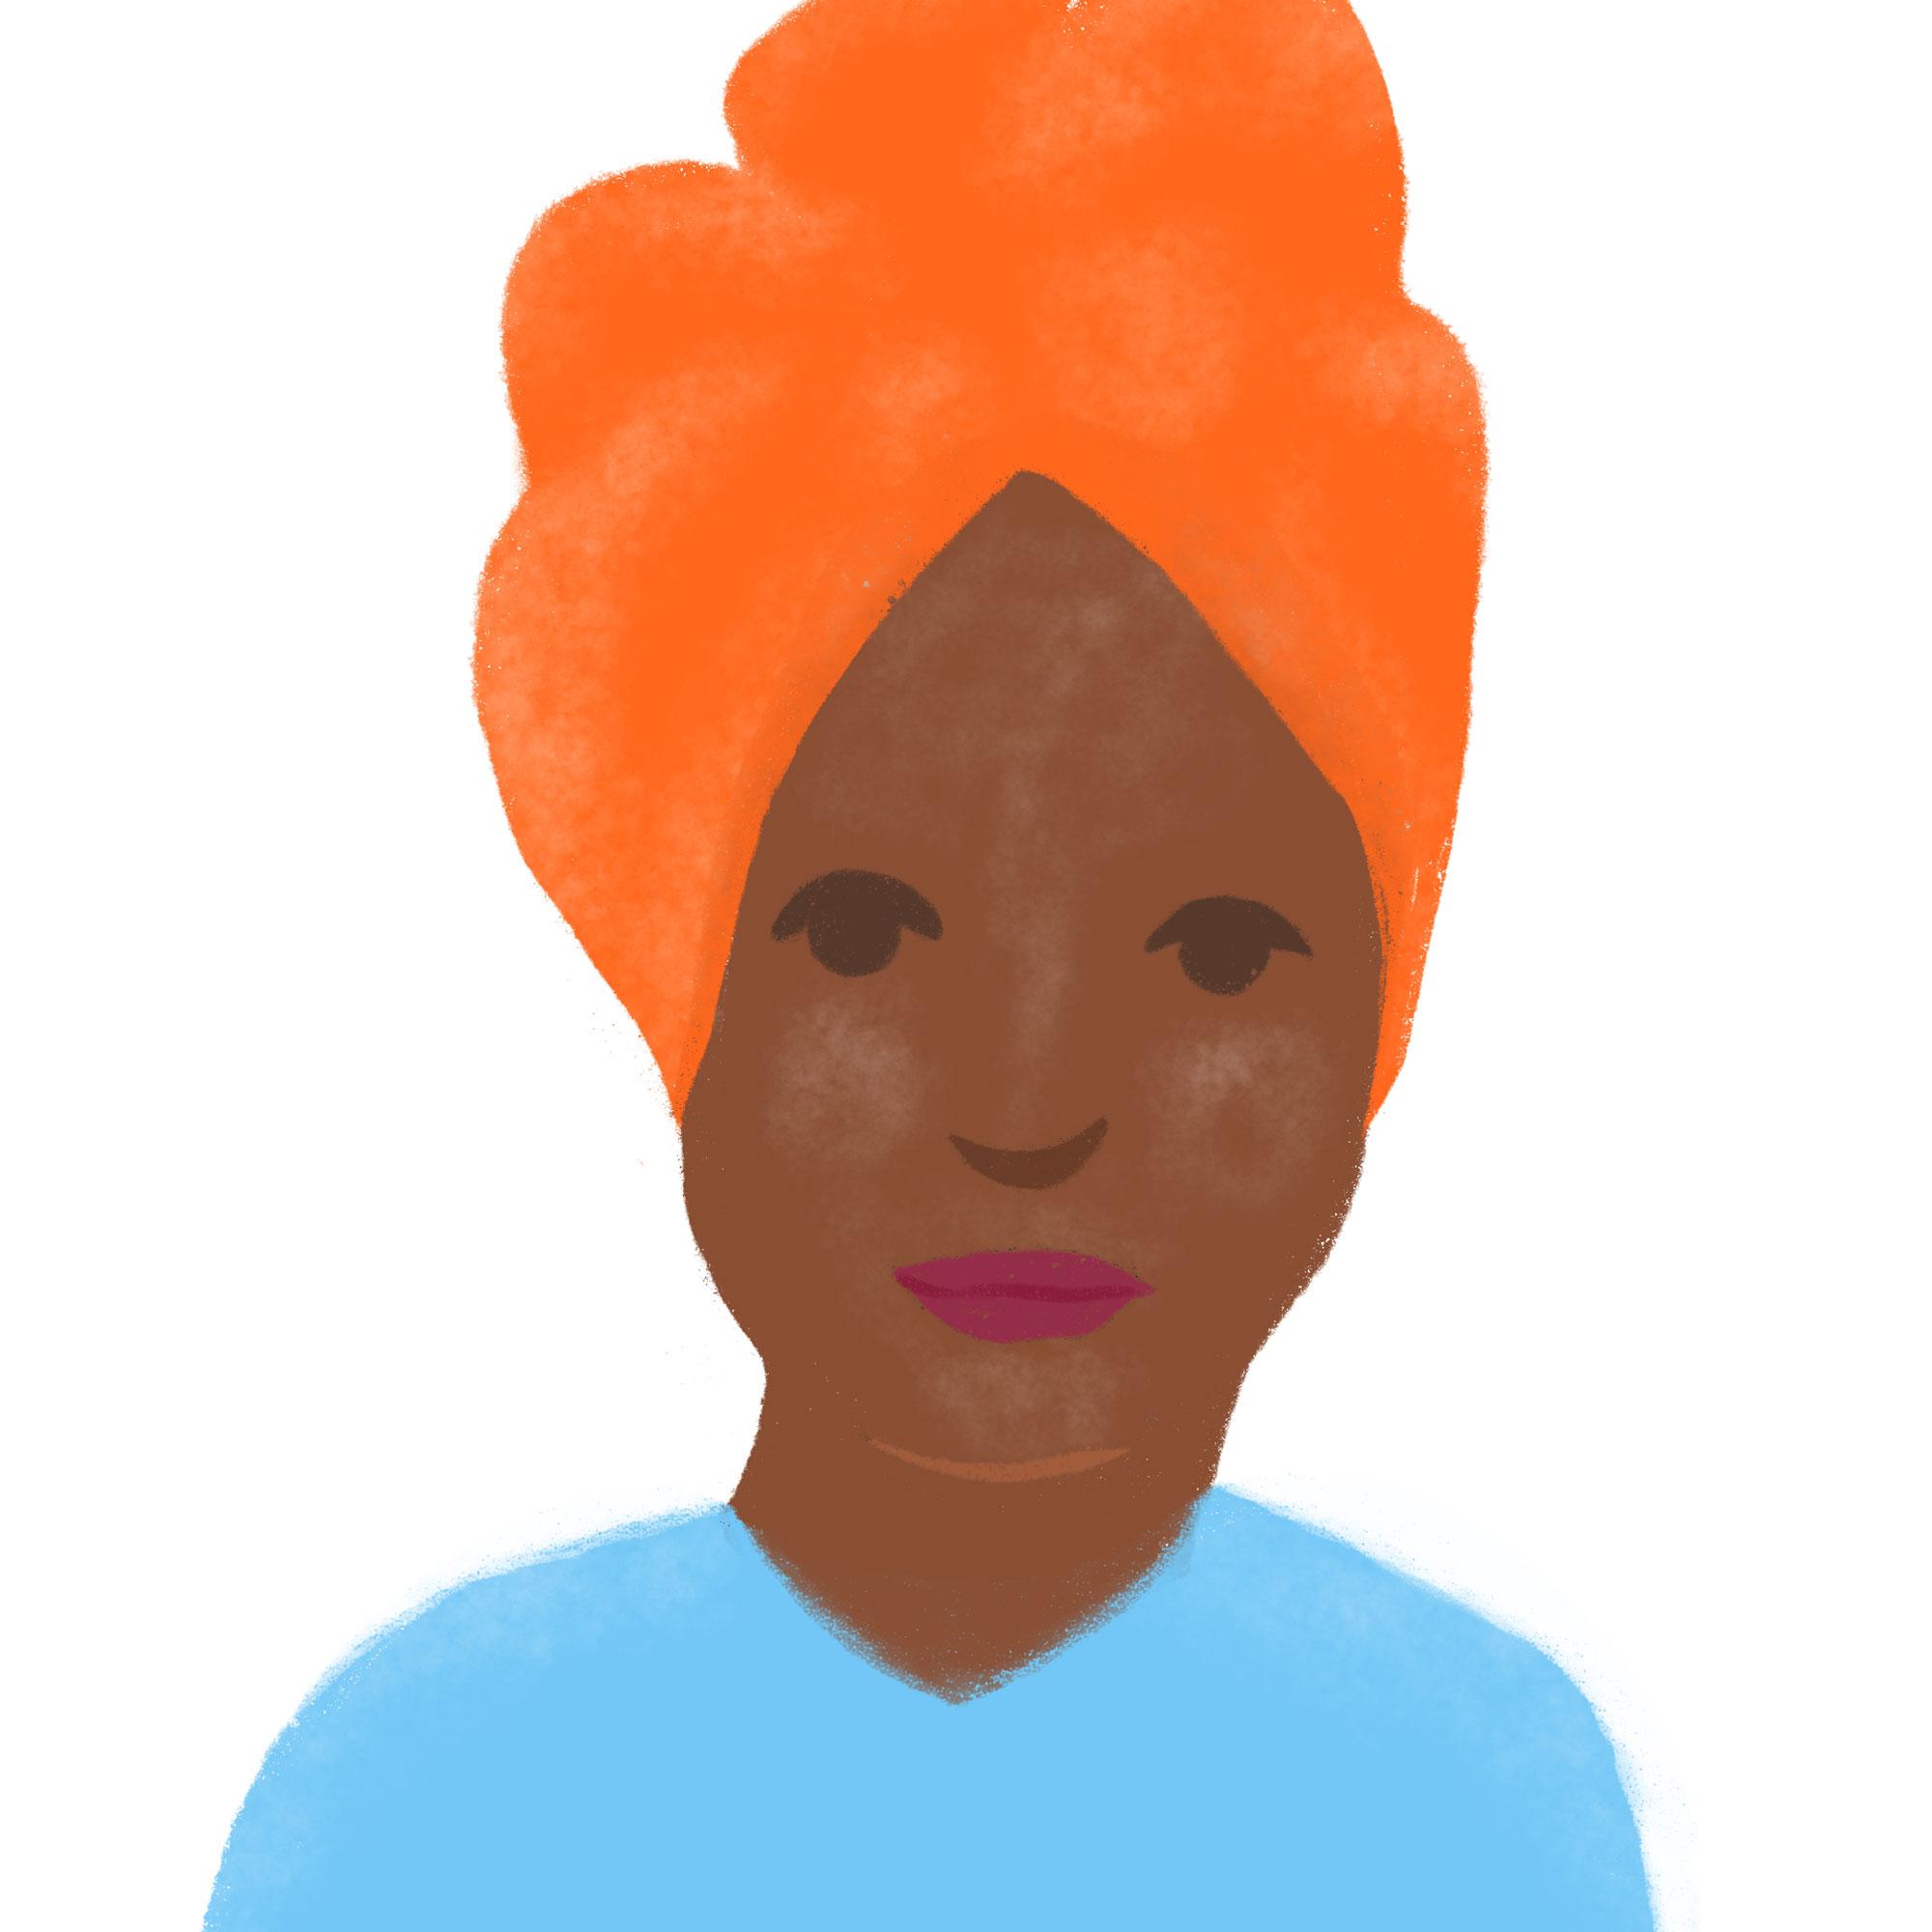 Illustration of black woman wearing an orange turban and blue shirt